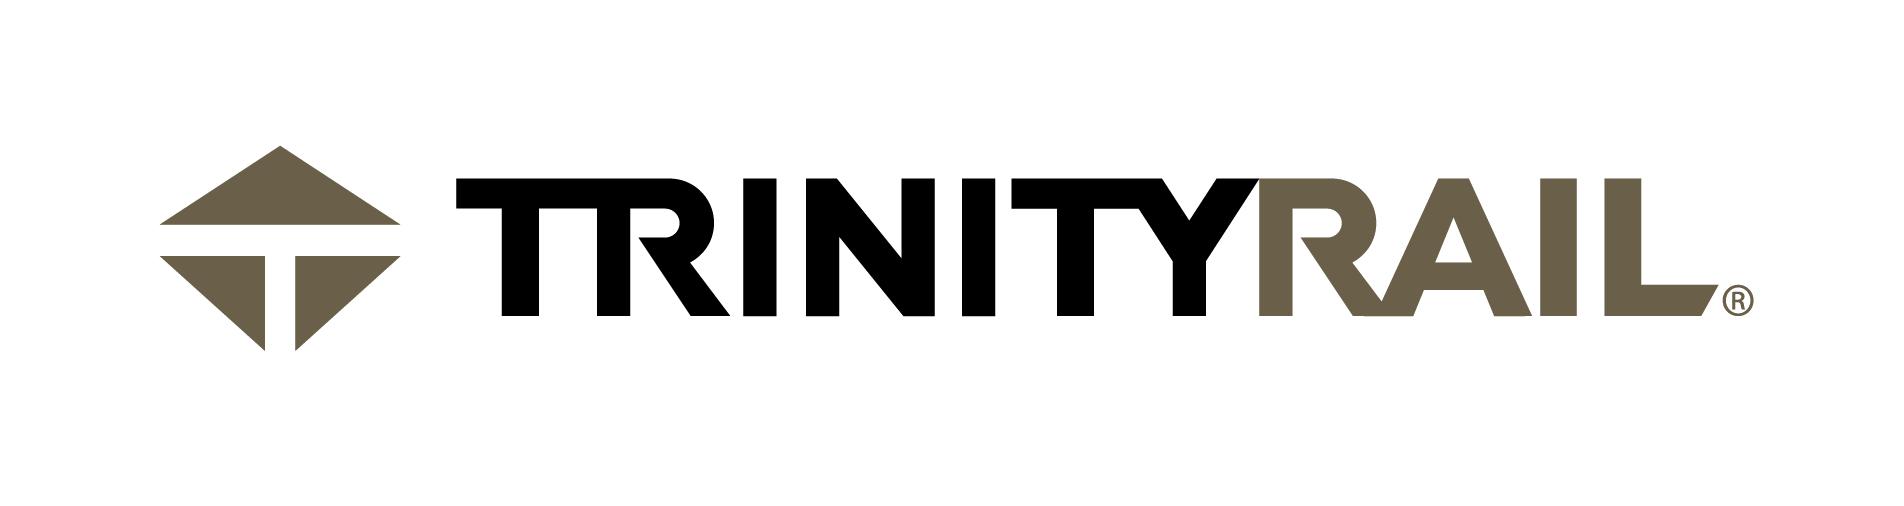 TrinityRail Logo 2019 website